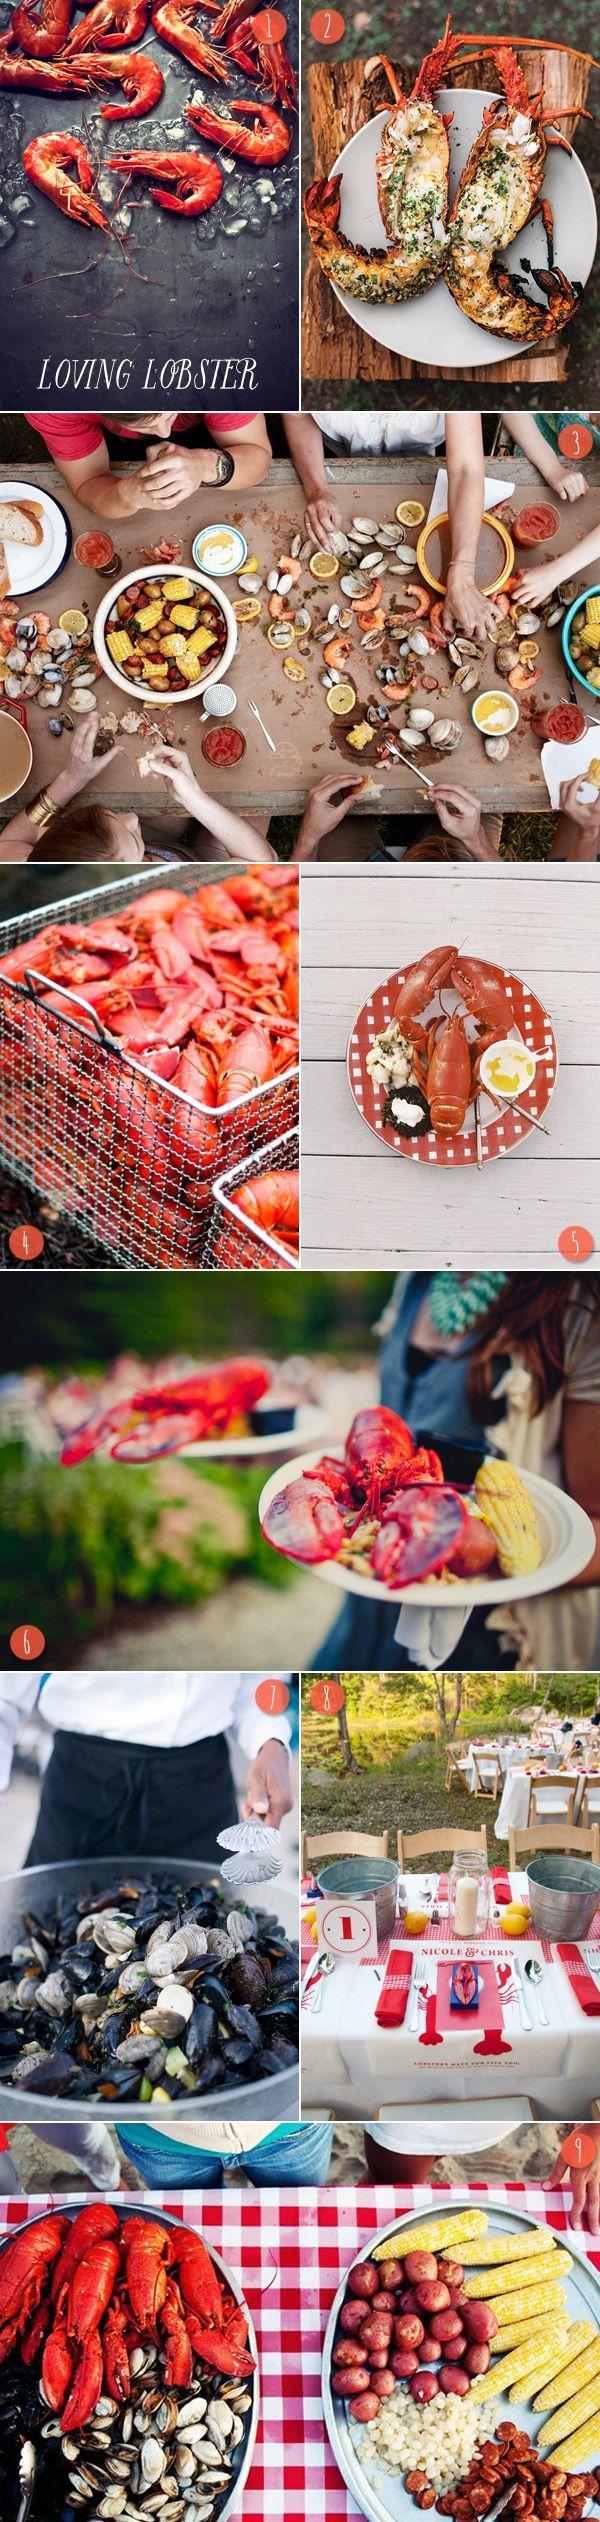 Summer Lobster Boil Inspiration